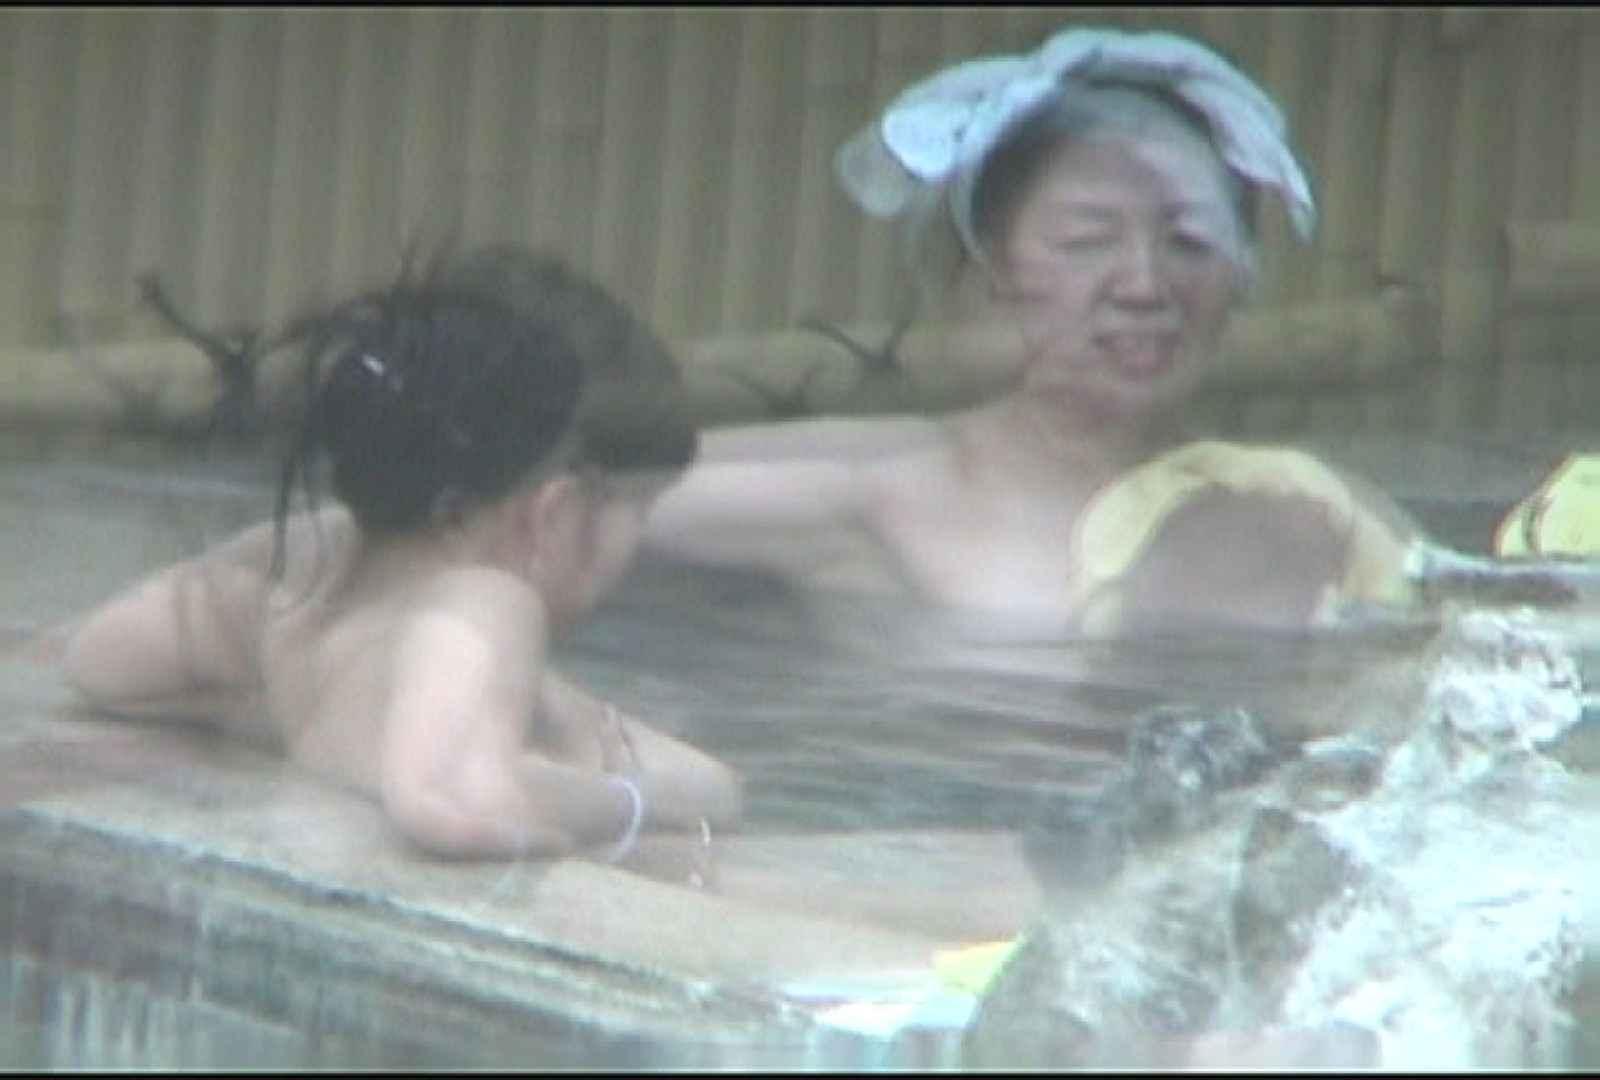 Aquaな露天風呂Vol.145 盗撮映像  78Pix 16